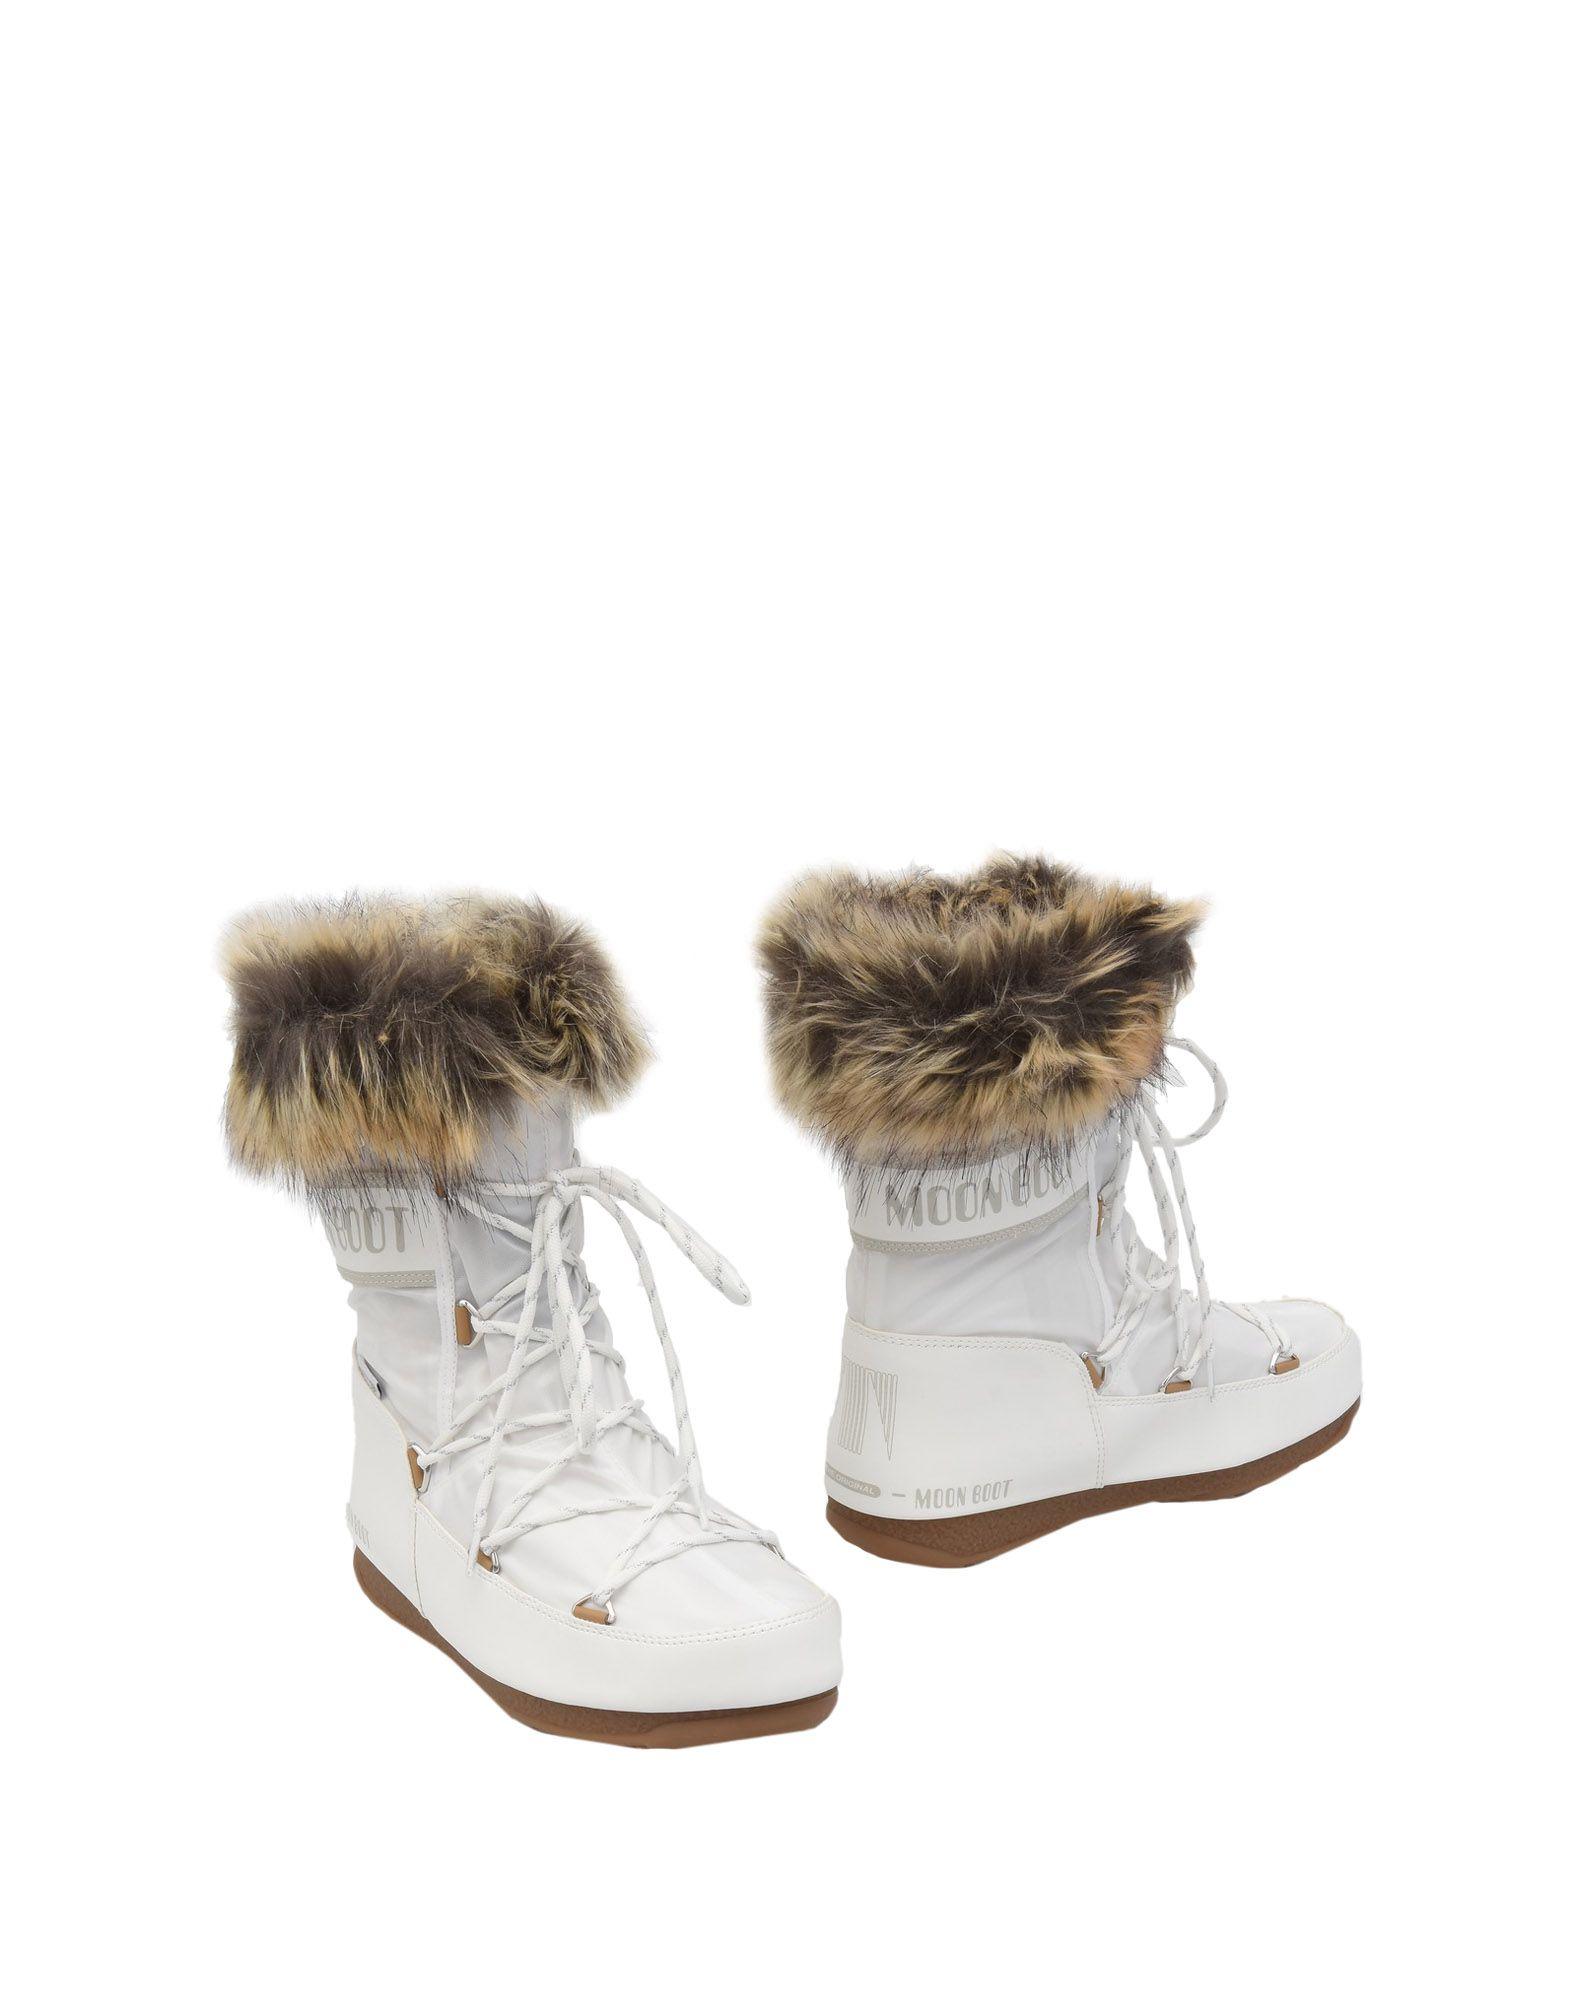 Moon Boot  W.E. Monaco Boot Low Wp - Ankle Boot Monaco - Women Moon Boot Ankle Boots online on  United Kingdom - 11440509JF 3feea0